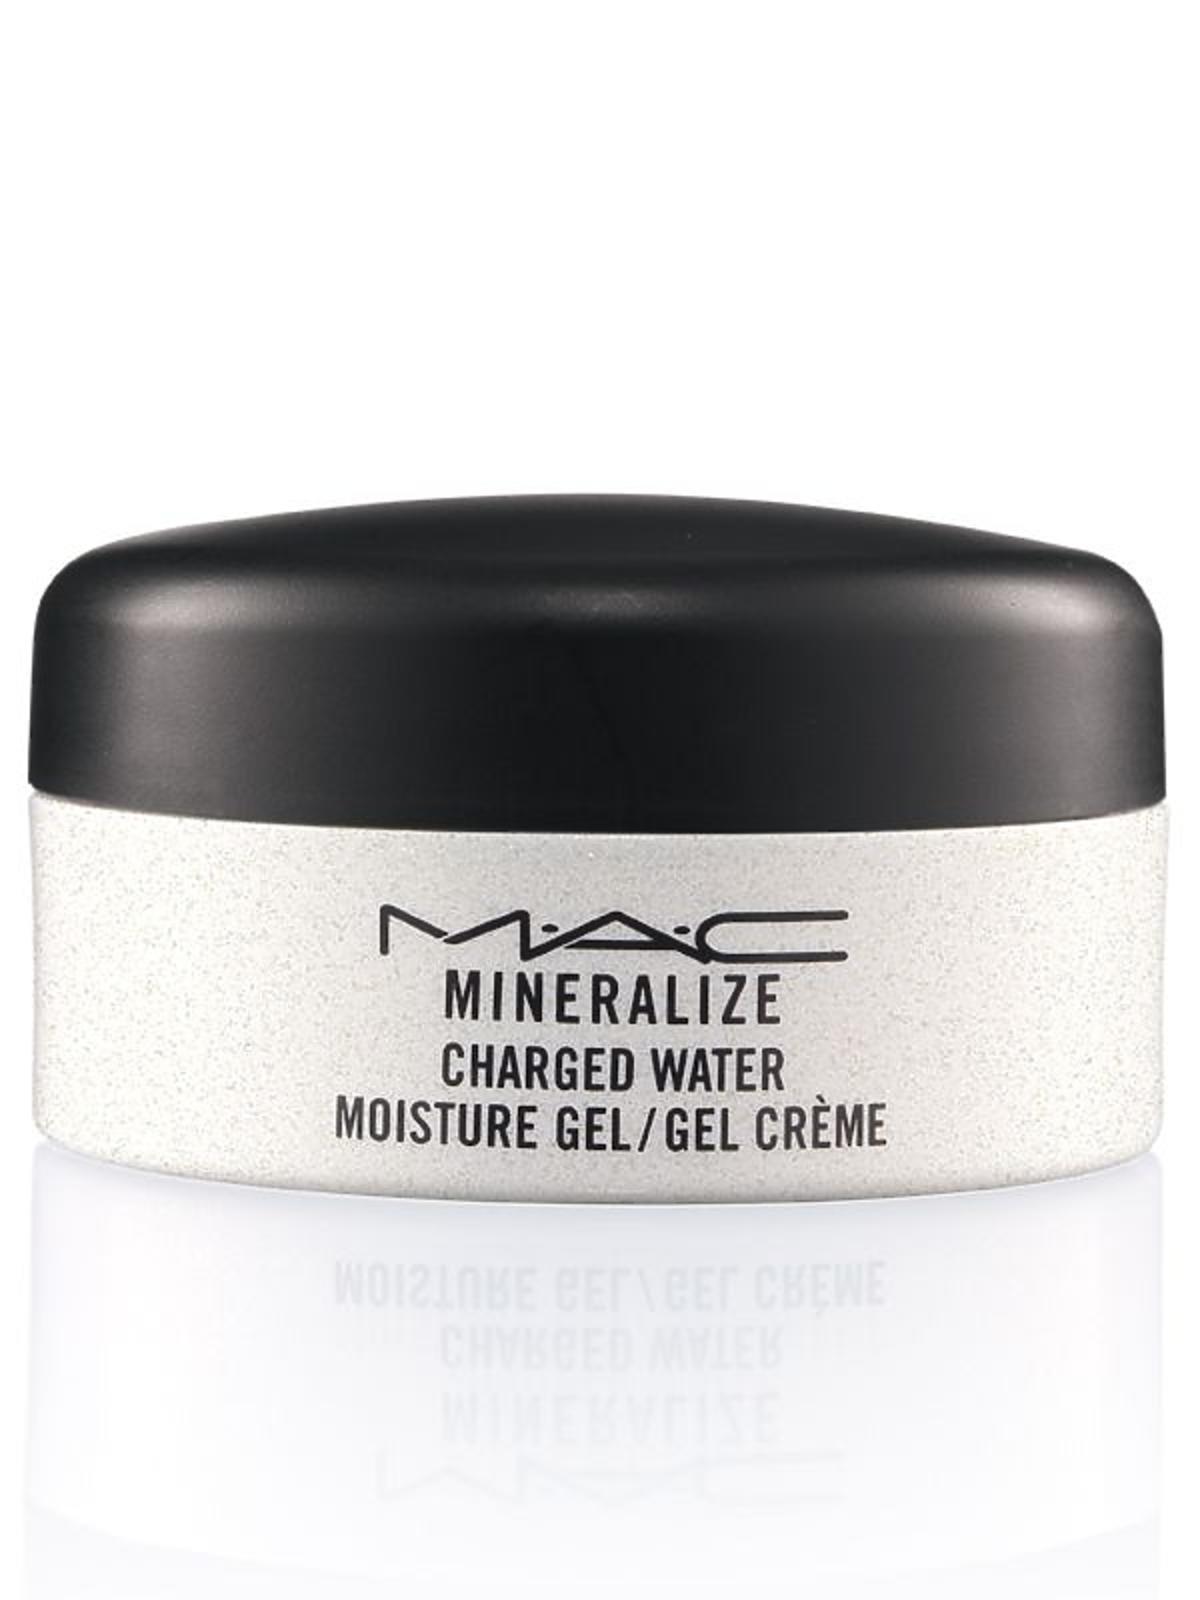 MinerailizeSkincare-MineralizeChargedWater-MoistureGel-72.jpg